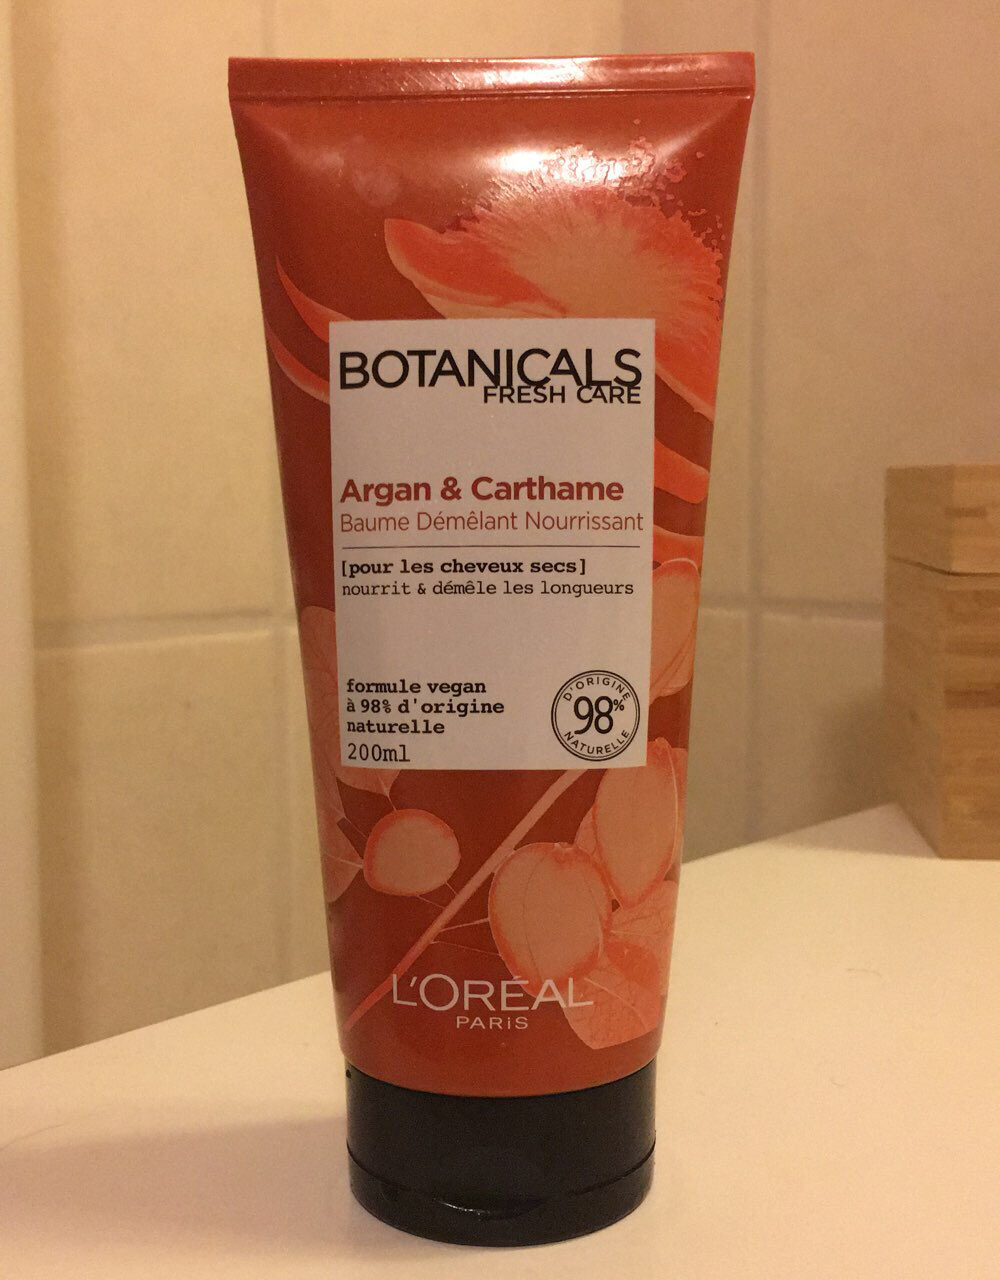 Botanicals Fresh Care - Product - en